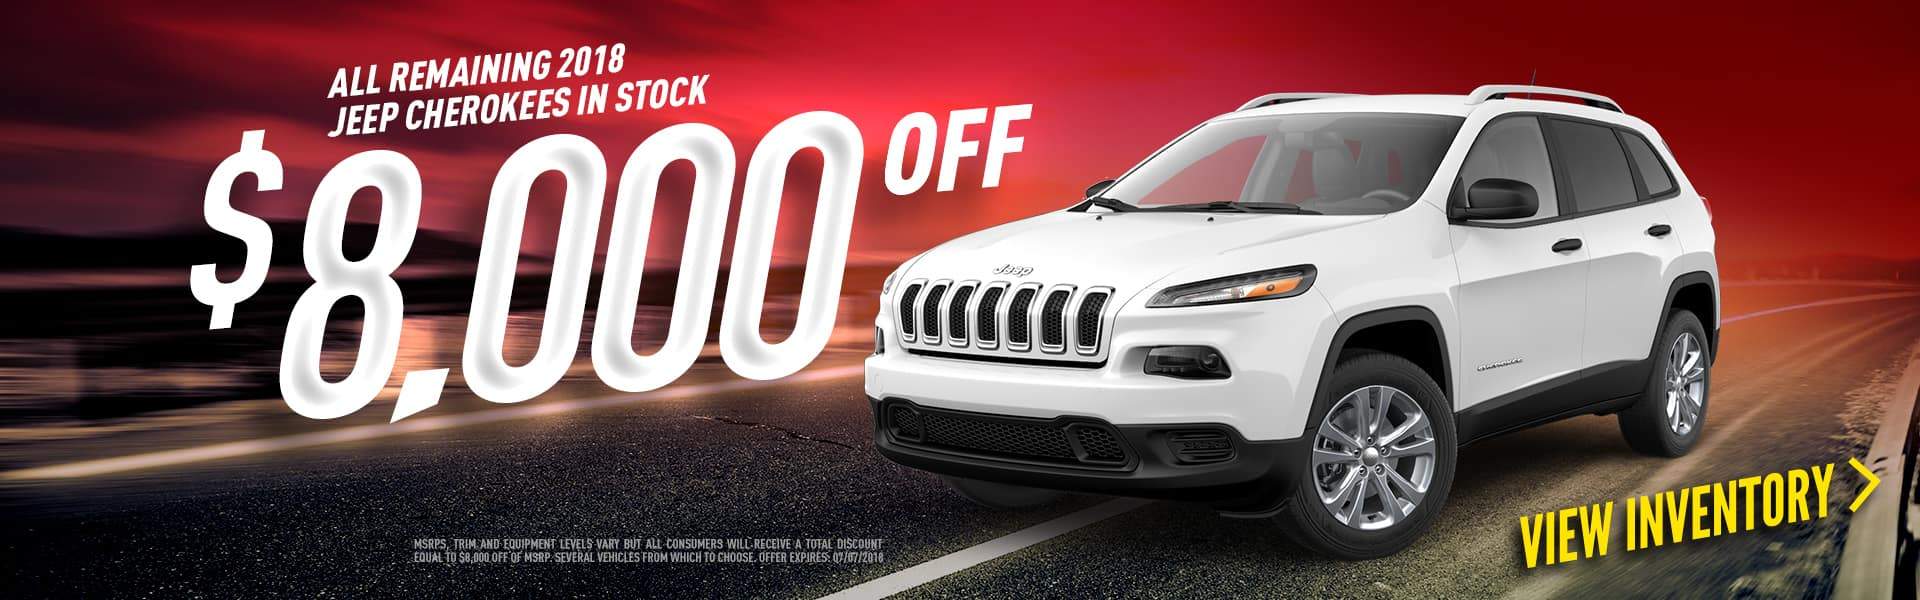 2018-jeep-cherokee-8000-off